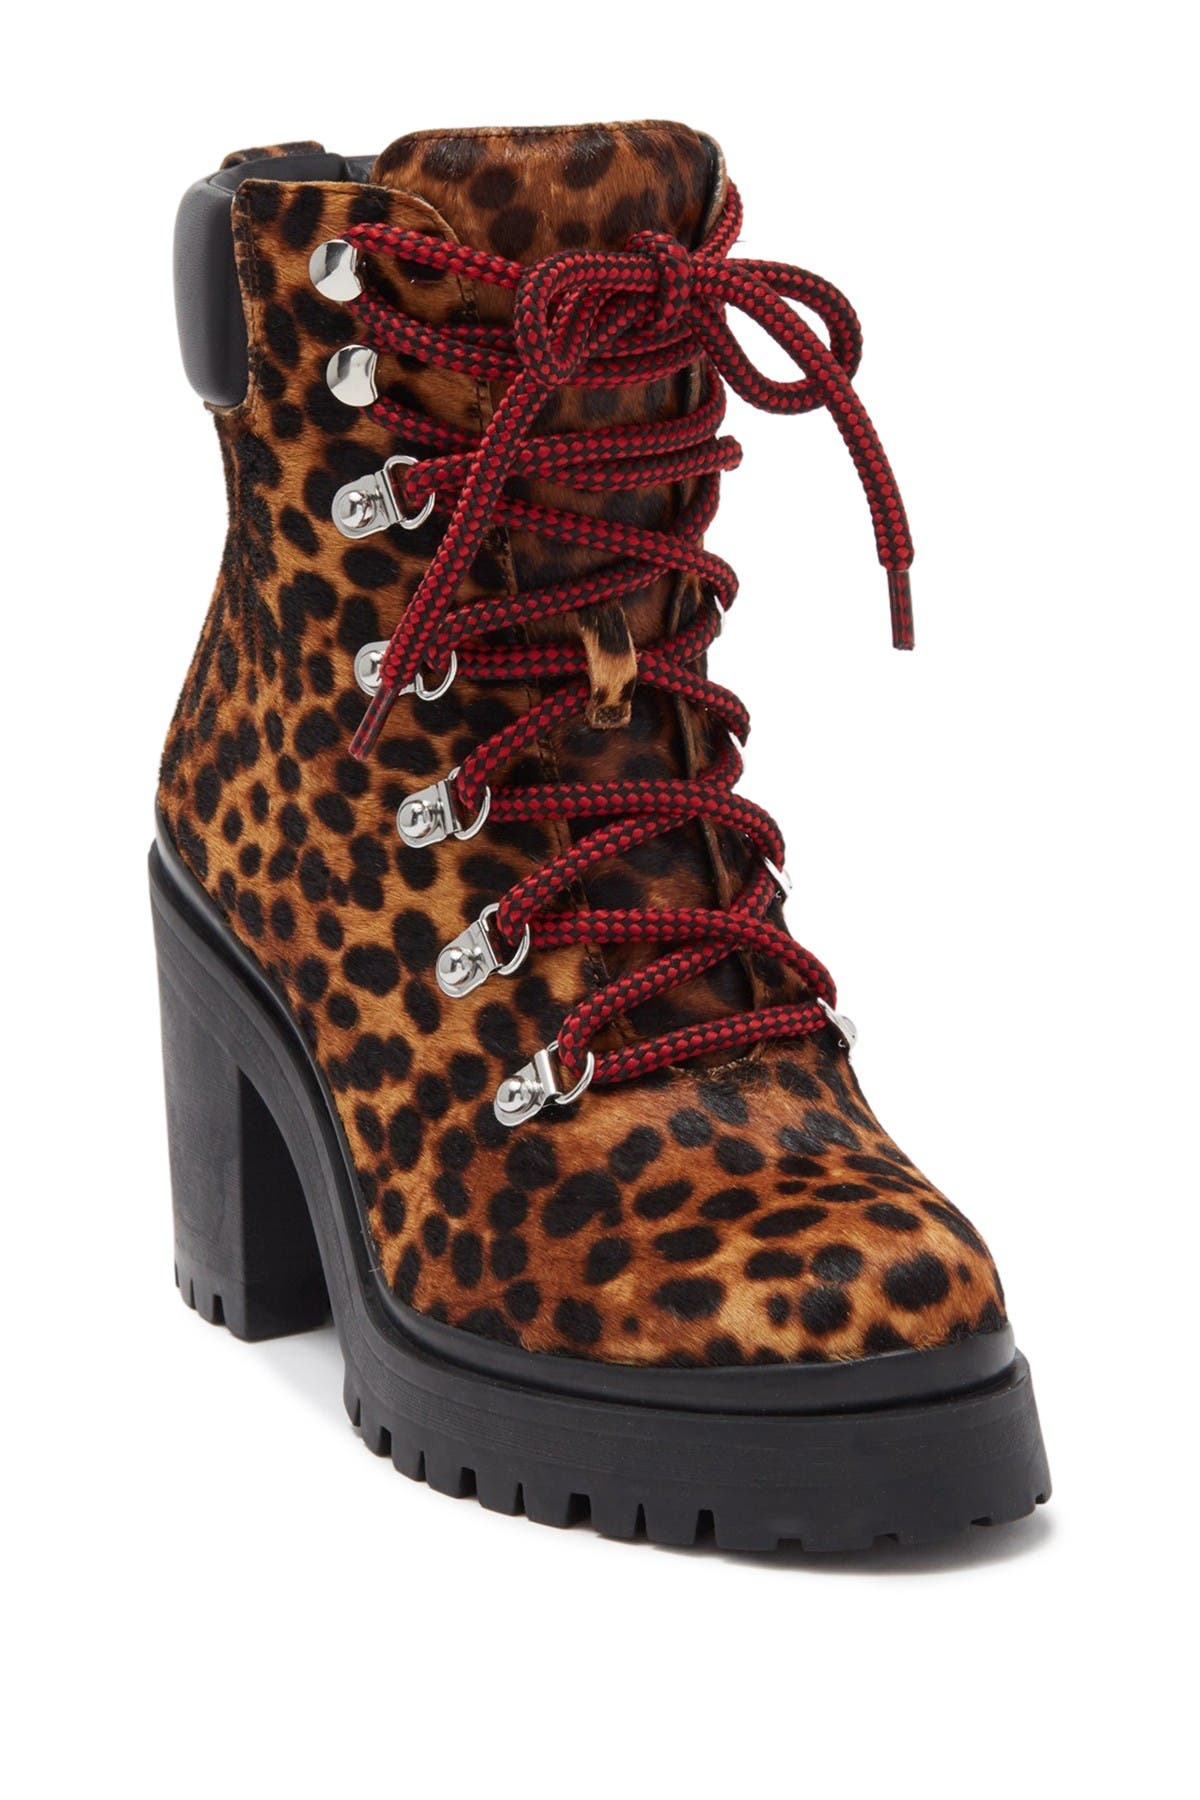 Image of Rebecca Minkoff Maihlo Leopard Printed Genuine Calf Hair Combat Boot